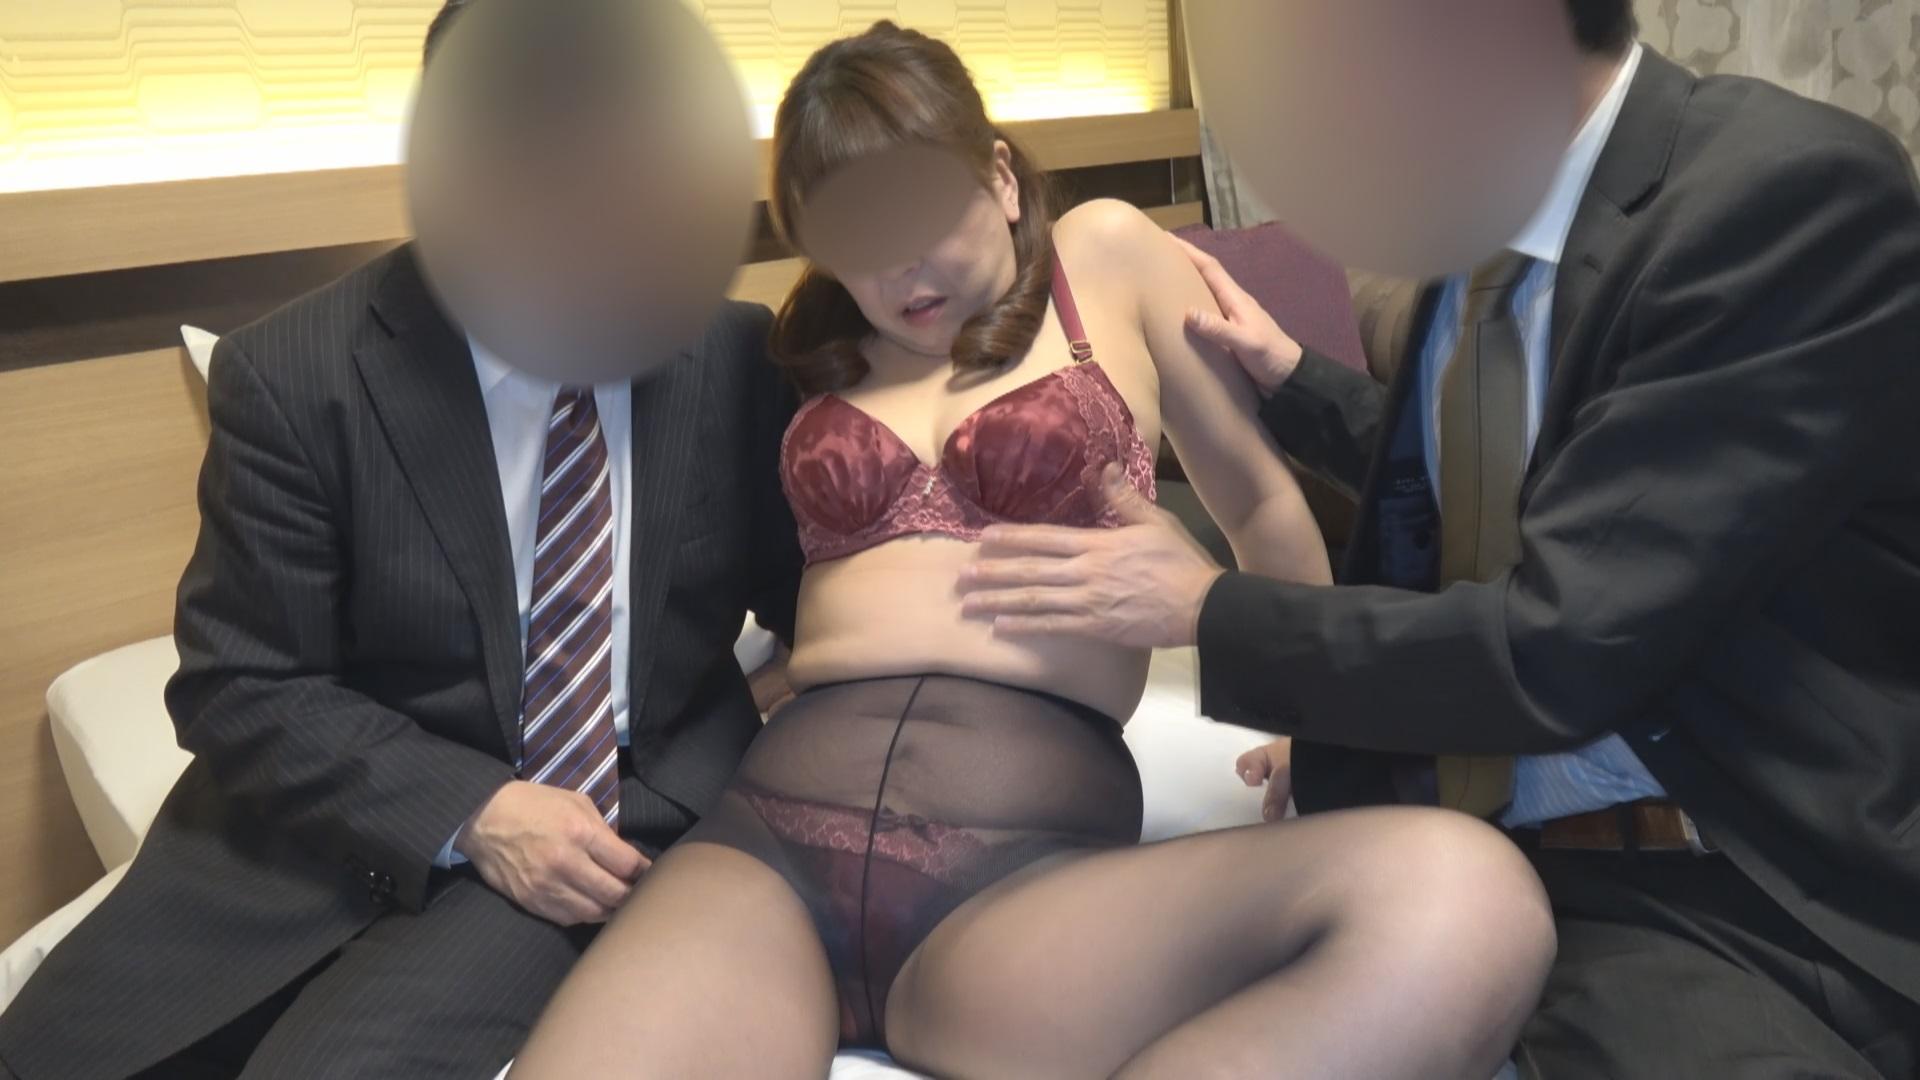 FC2 PPV 1007274 【個人撮影】由美子52歳、寝取られ3P編 閉経前の奥様が旦那の目の前で他人棒を挿入され膣内に注がれる子種